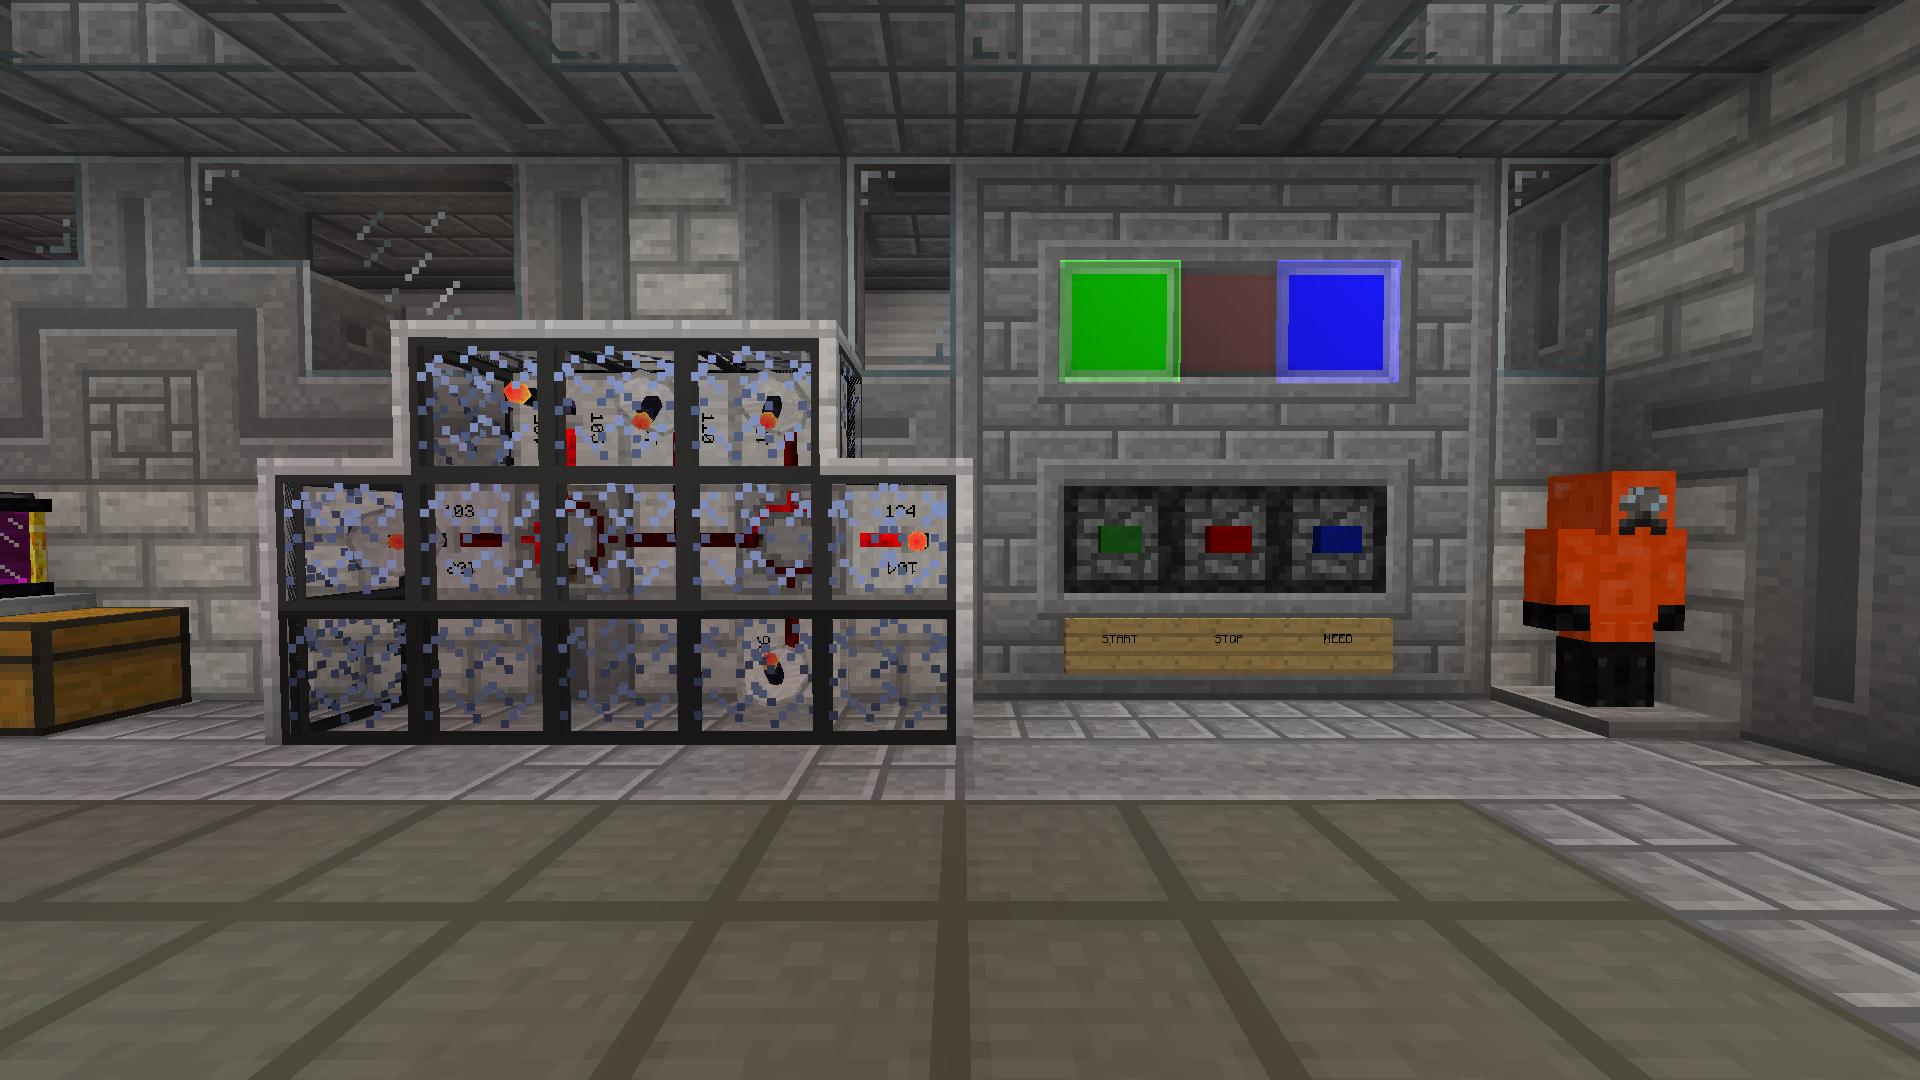 мод для майнкрафт 1.6.4 transformers addon for ic2 #1